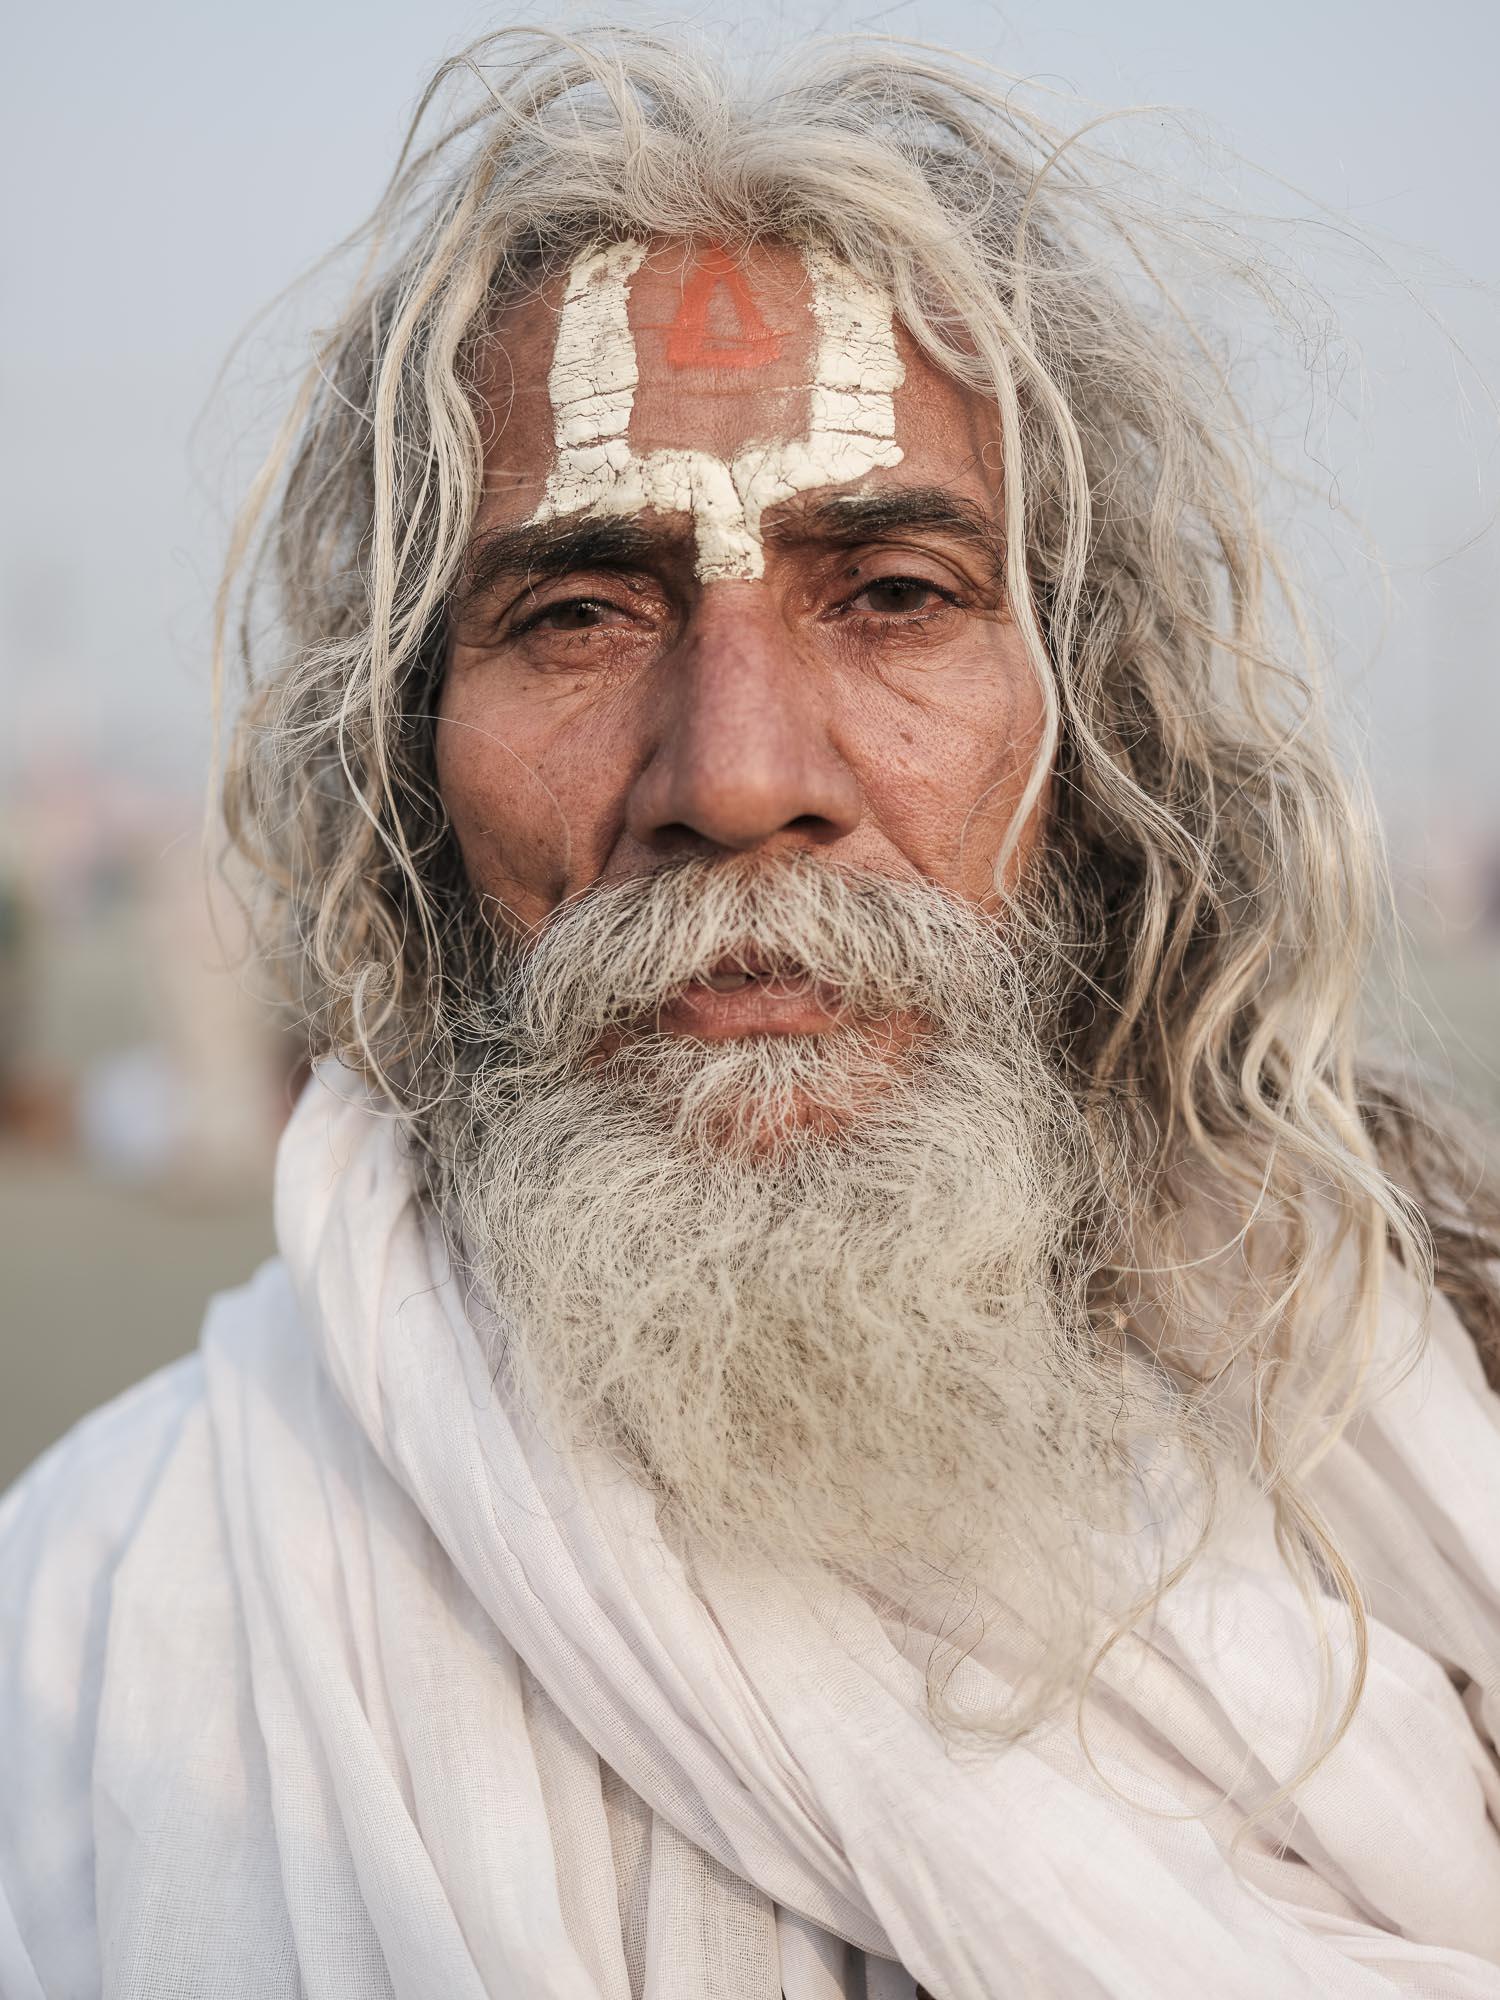 India old man Kumbh mela Commercial Editorial Portraiture Documentary Photographer fujifilm Director Singapore Jose Jeuland photography fashion